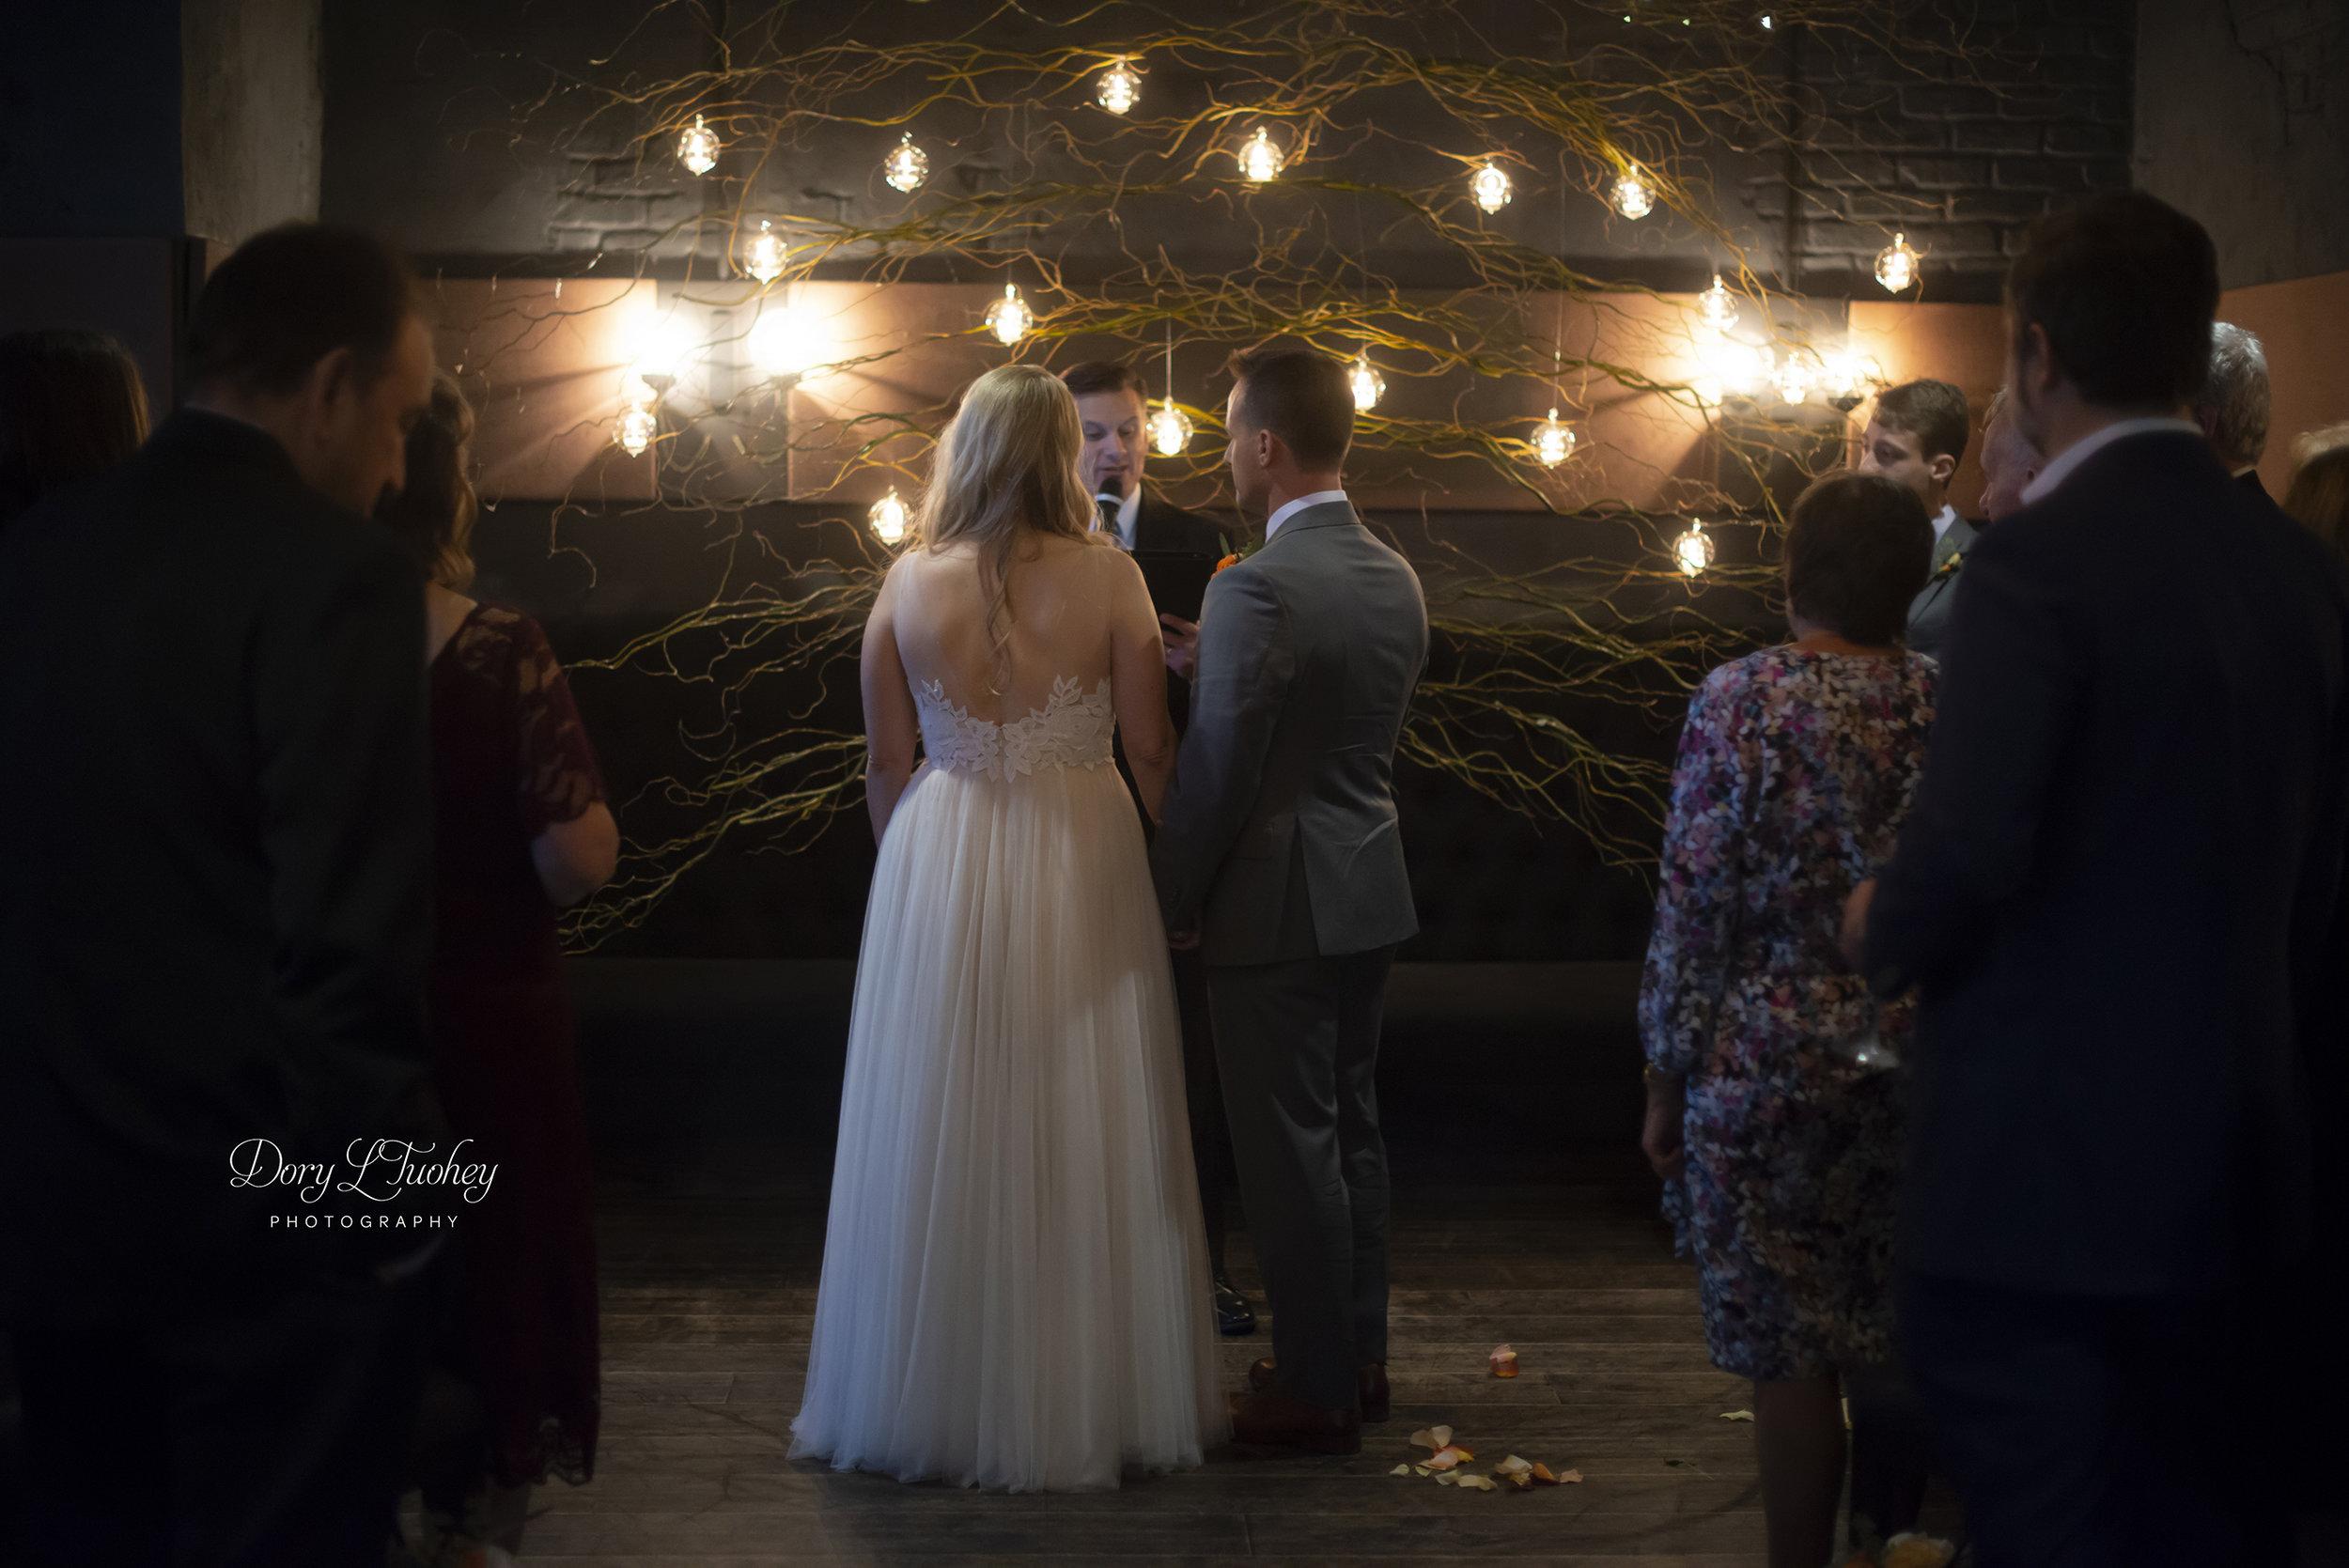 Rookery_chicago_dory_photographer_wedding_stairs_bhldn_love_dawson_14.jpg